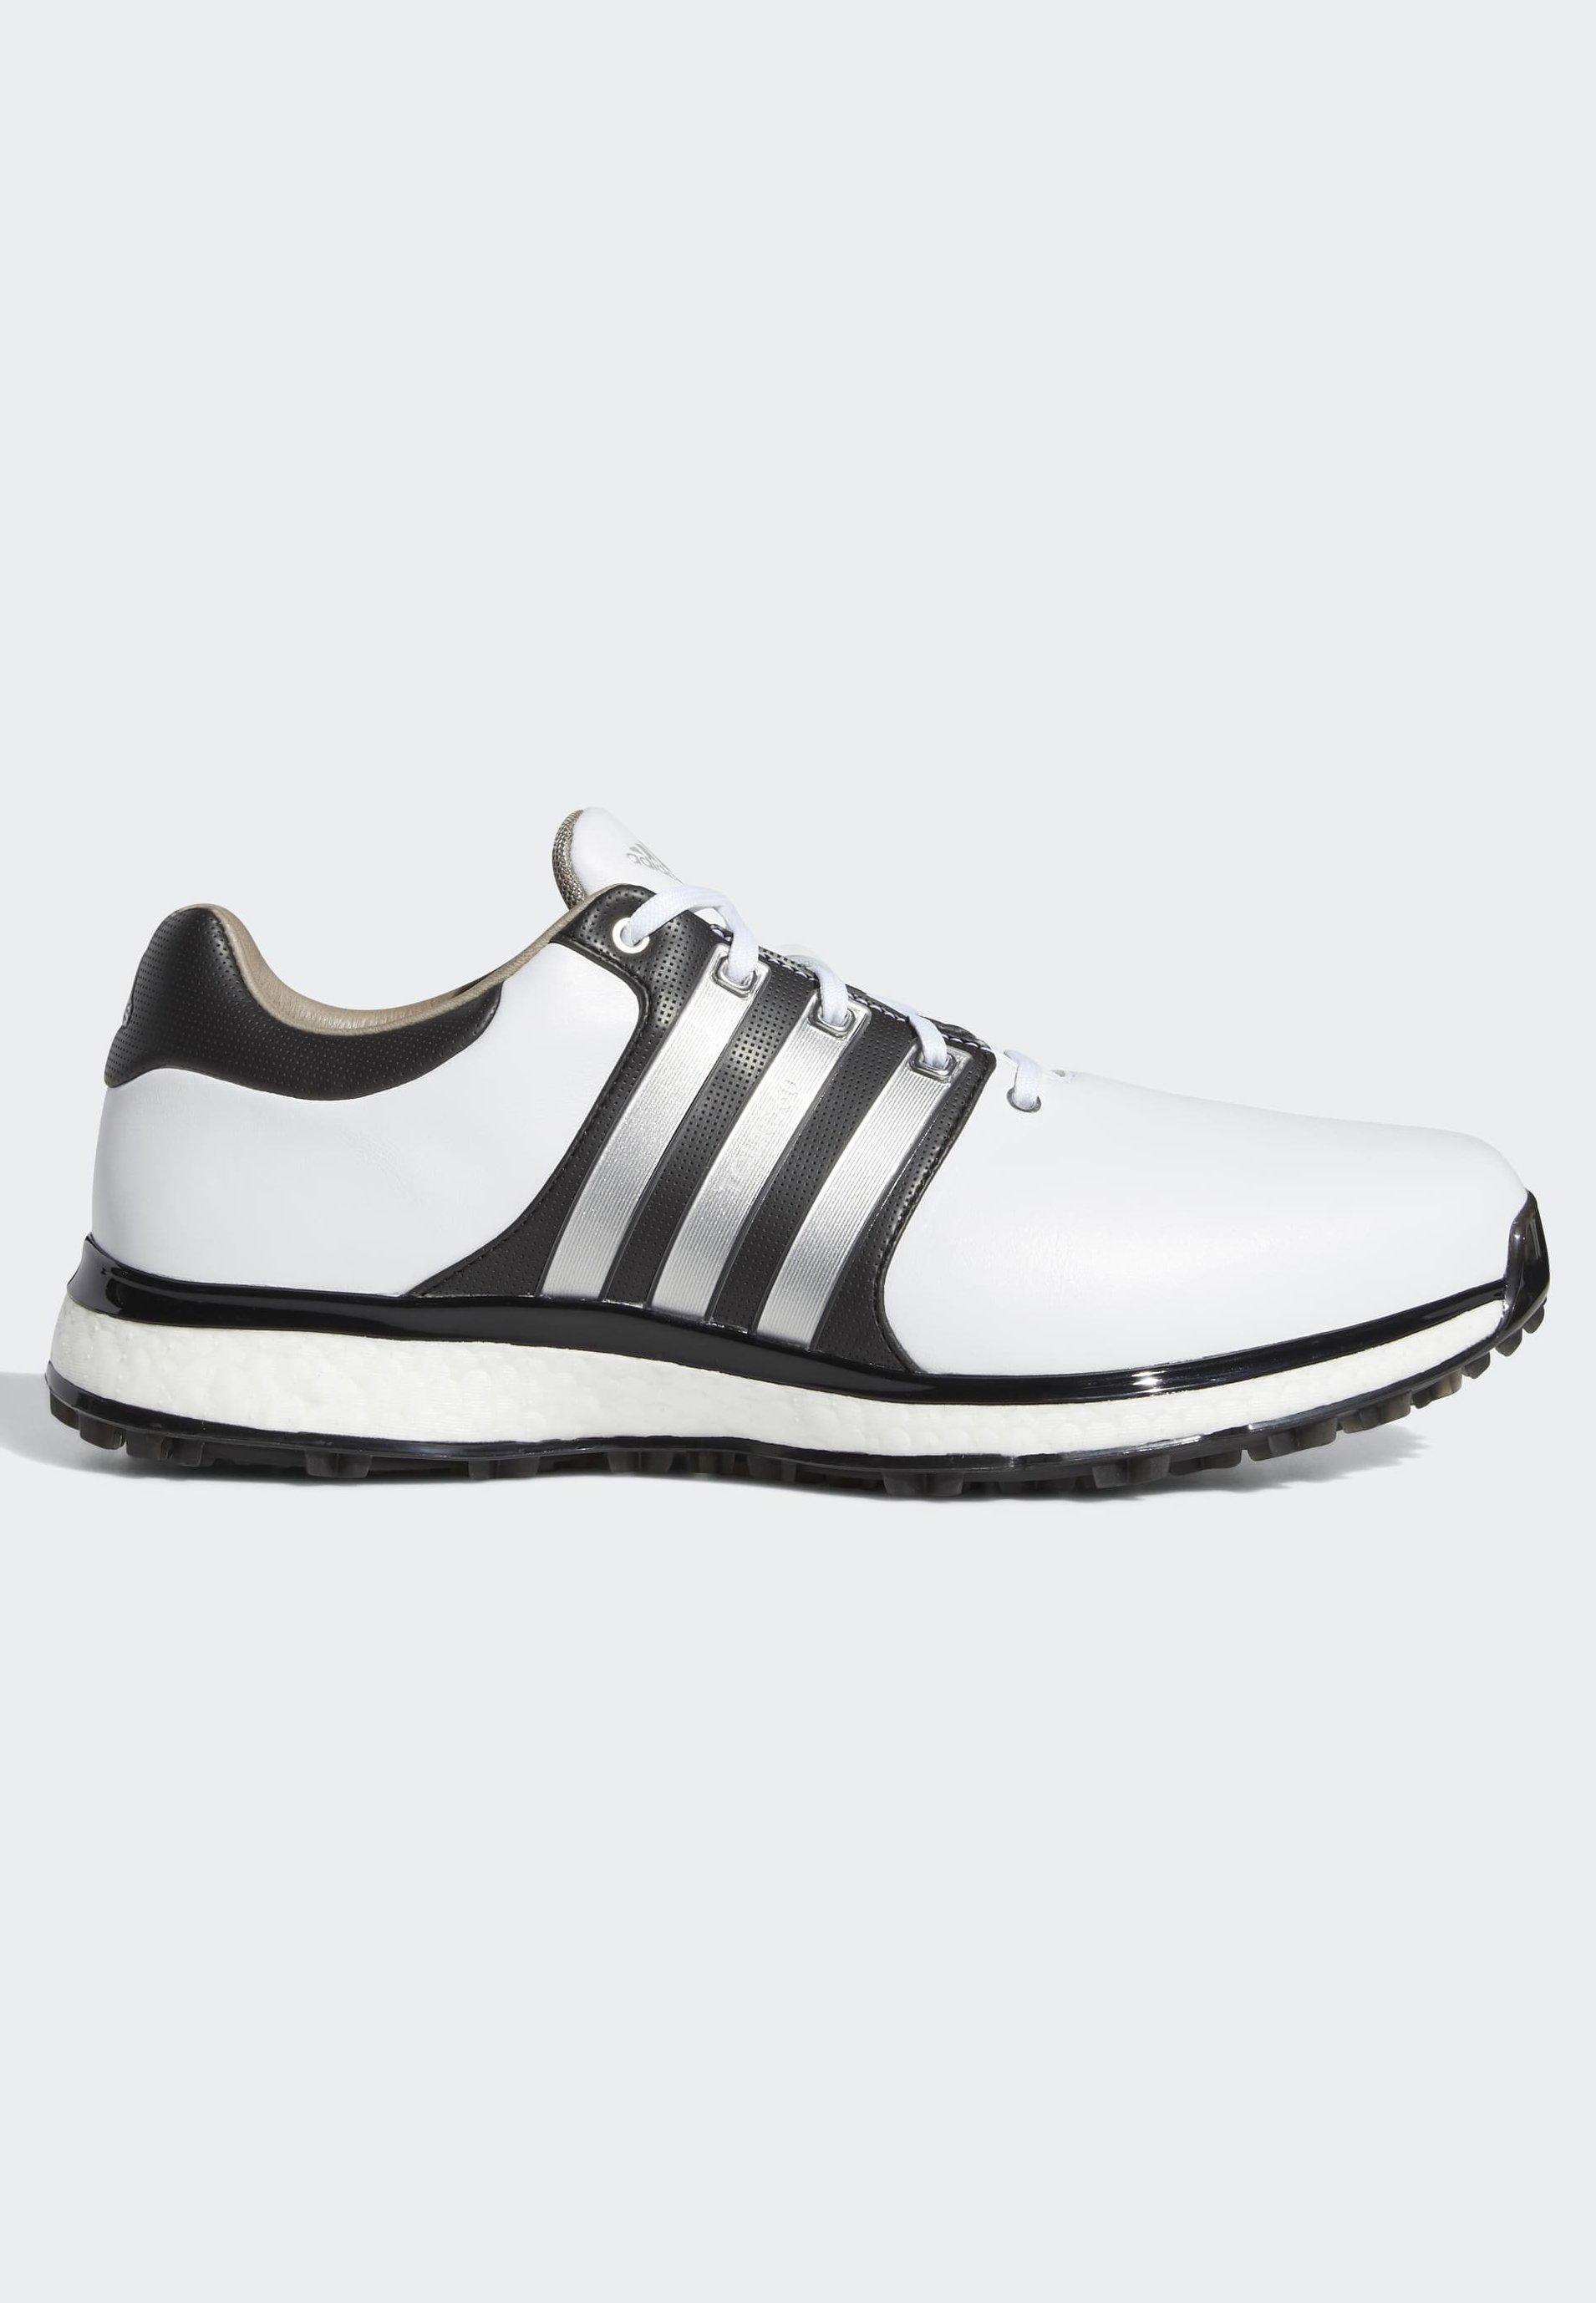 adidas Golf TOUR360 XT-SL SHOES - Scarpe da golf - white